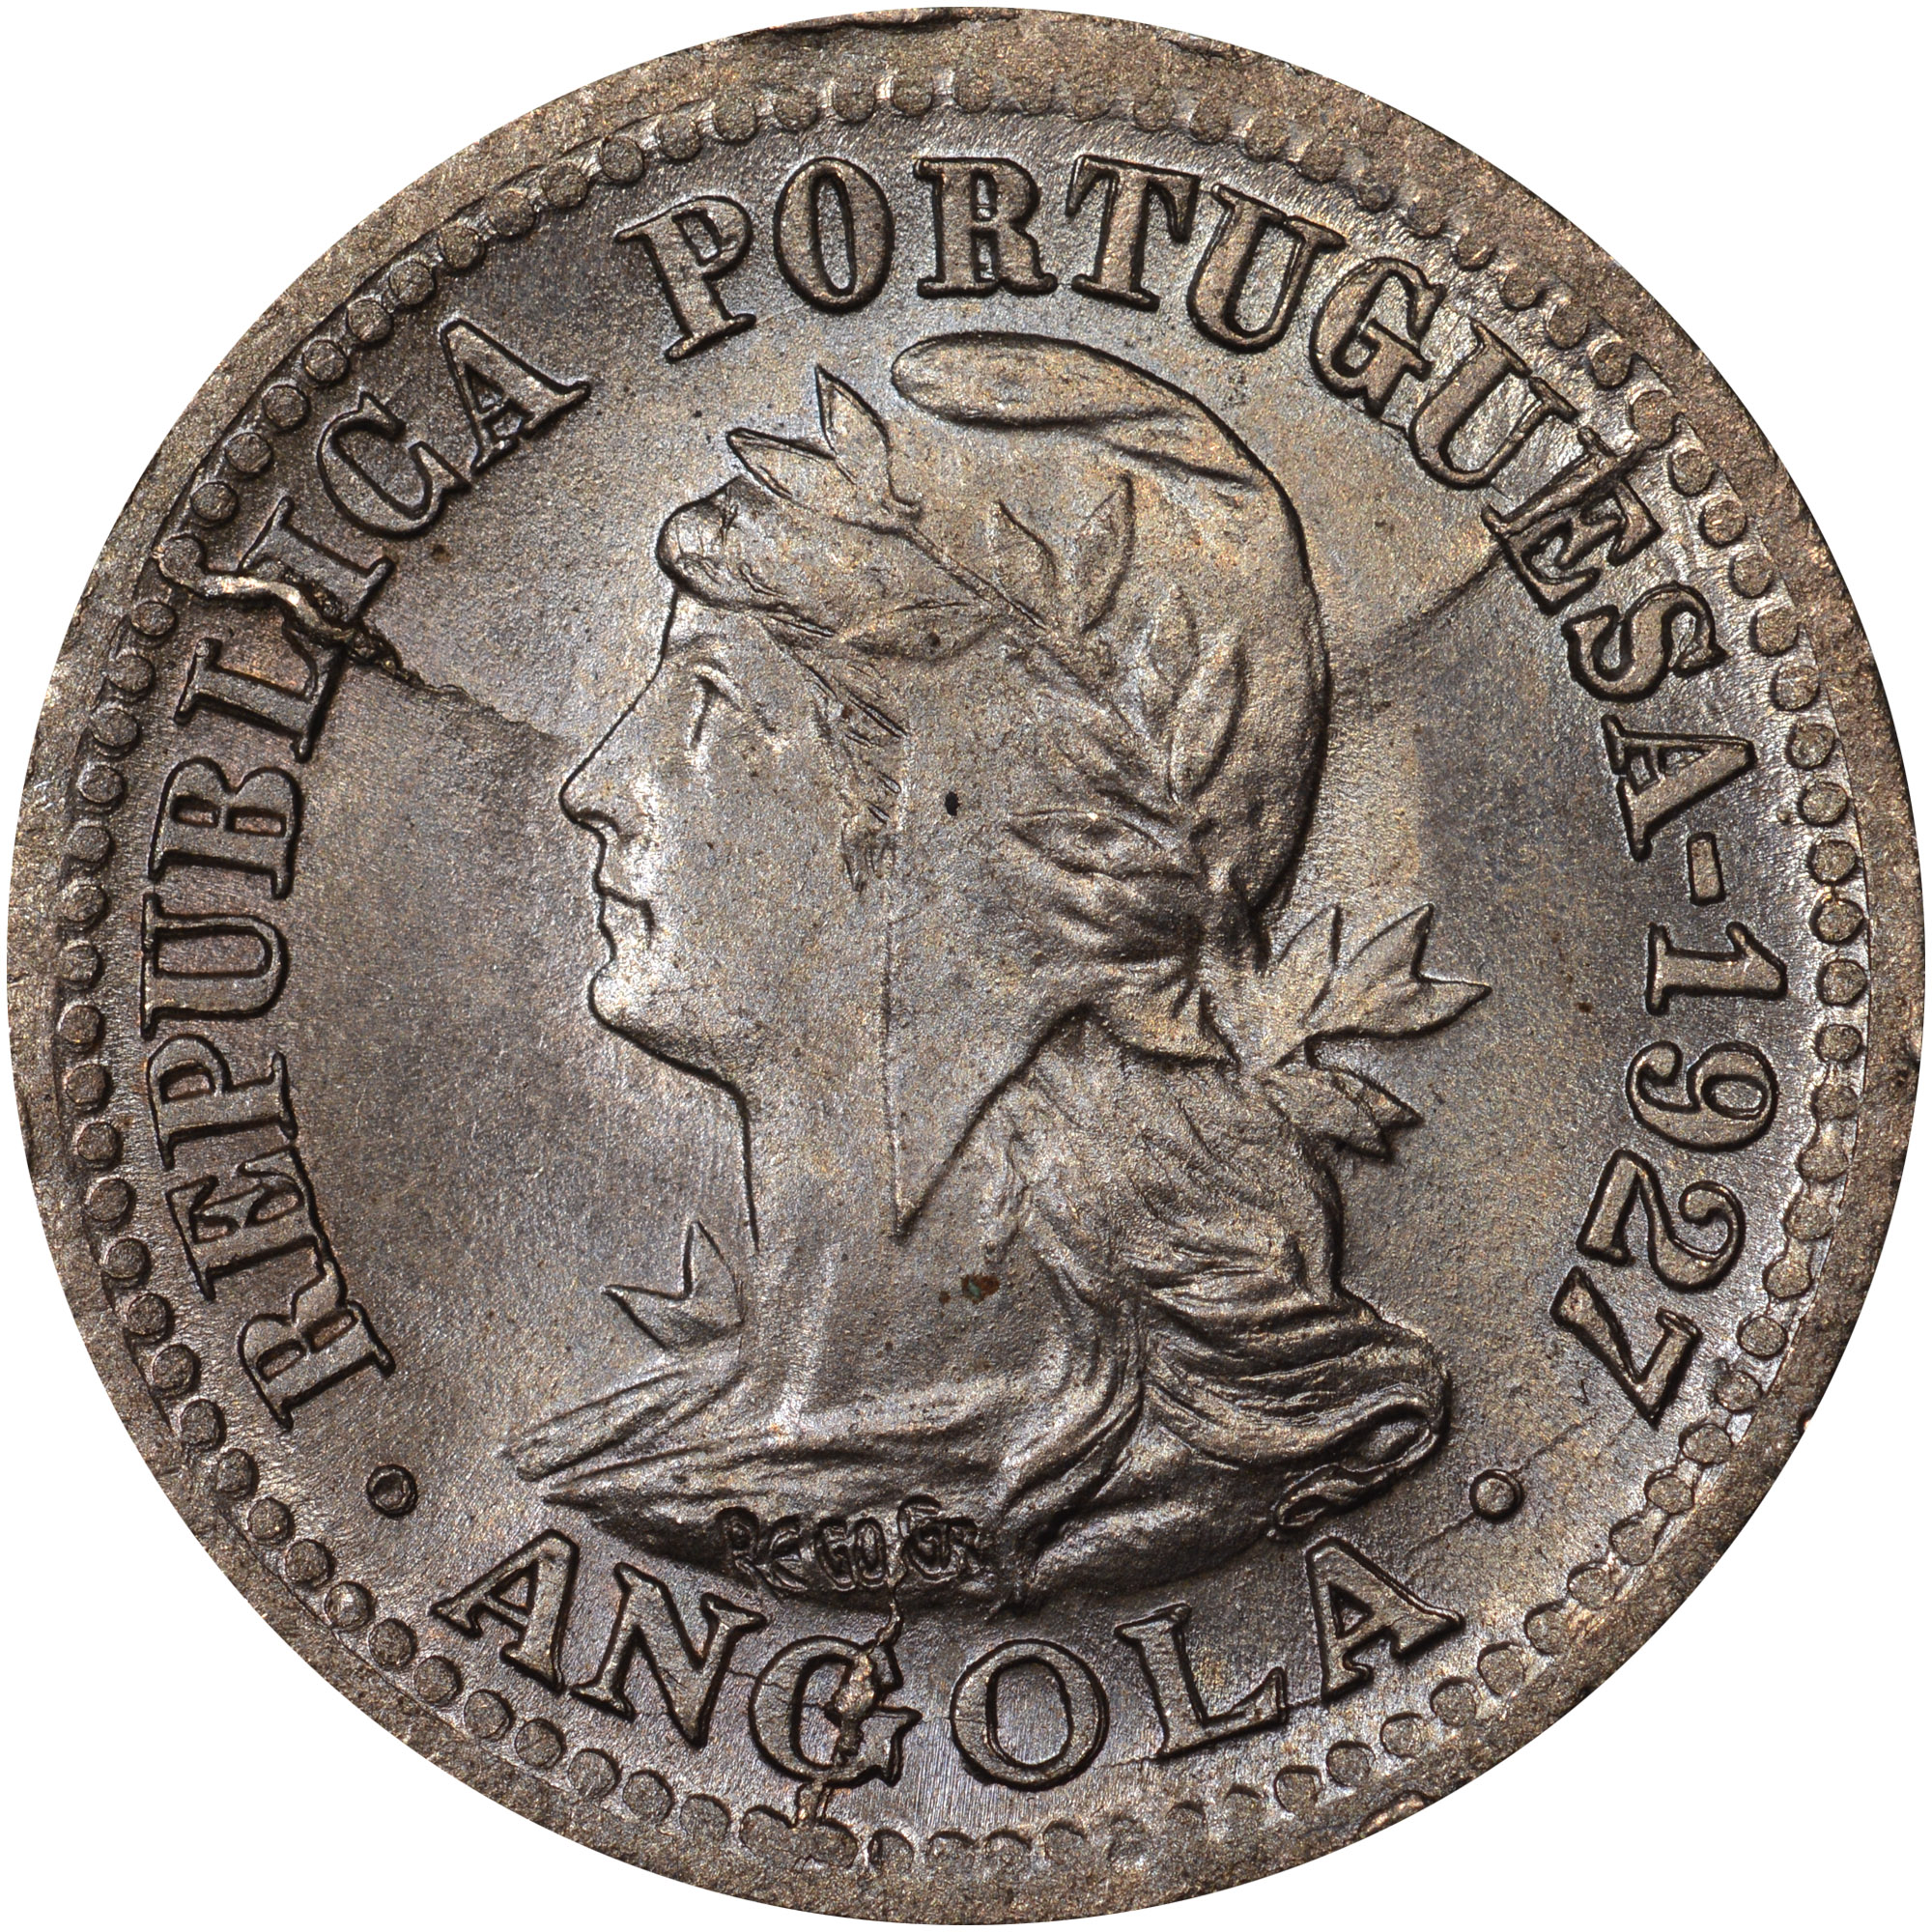 1927 Angola 5 Centavos, 1 Macuta obverse